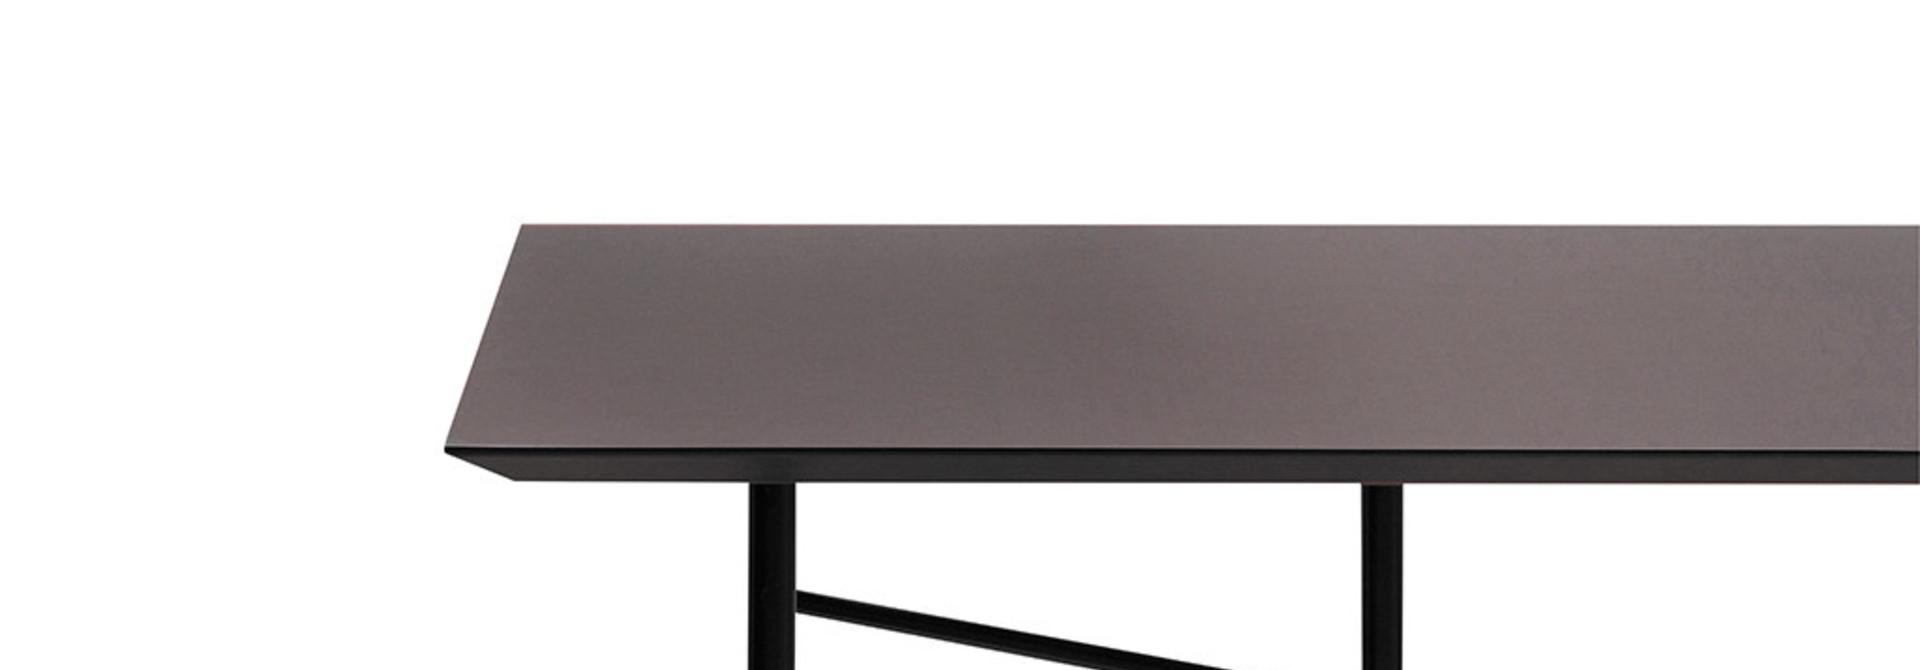 Mingle Table Top - 160 cm